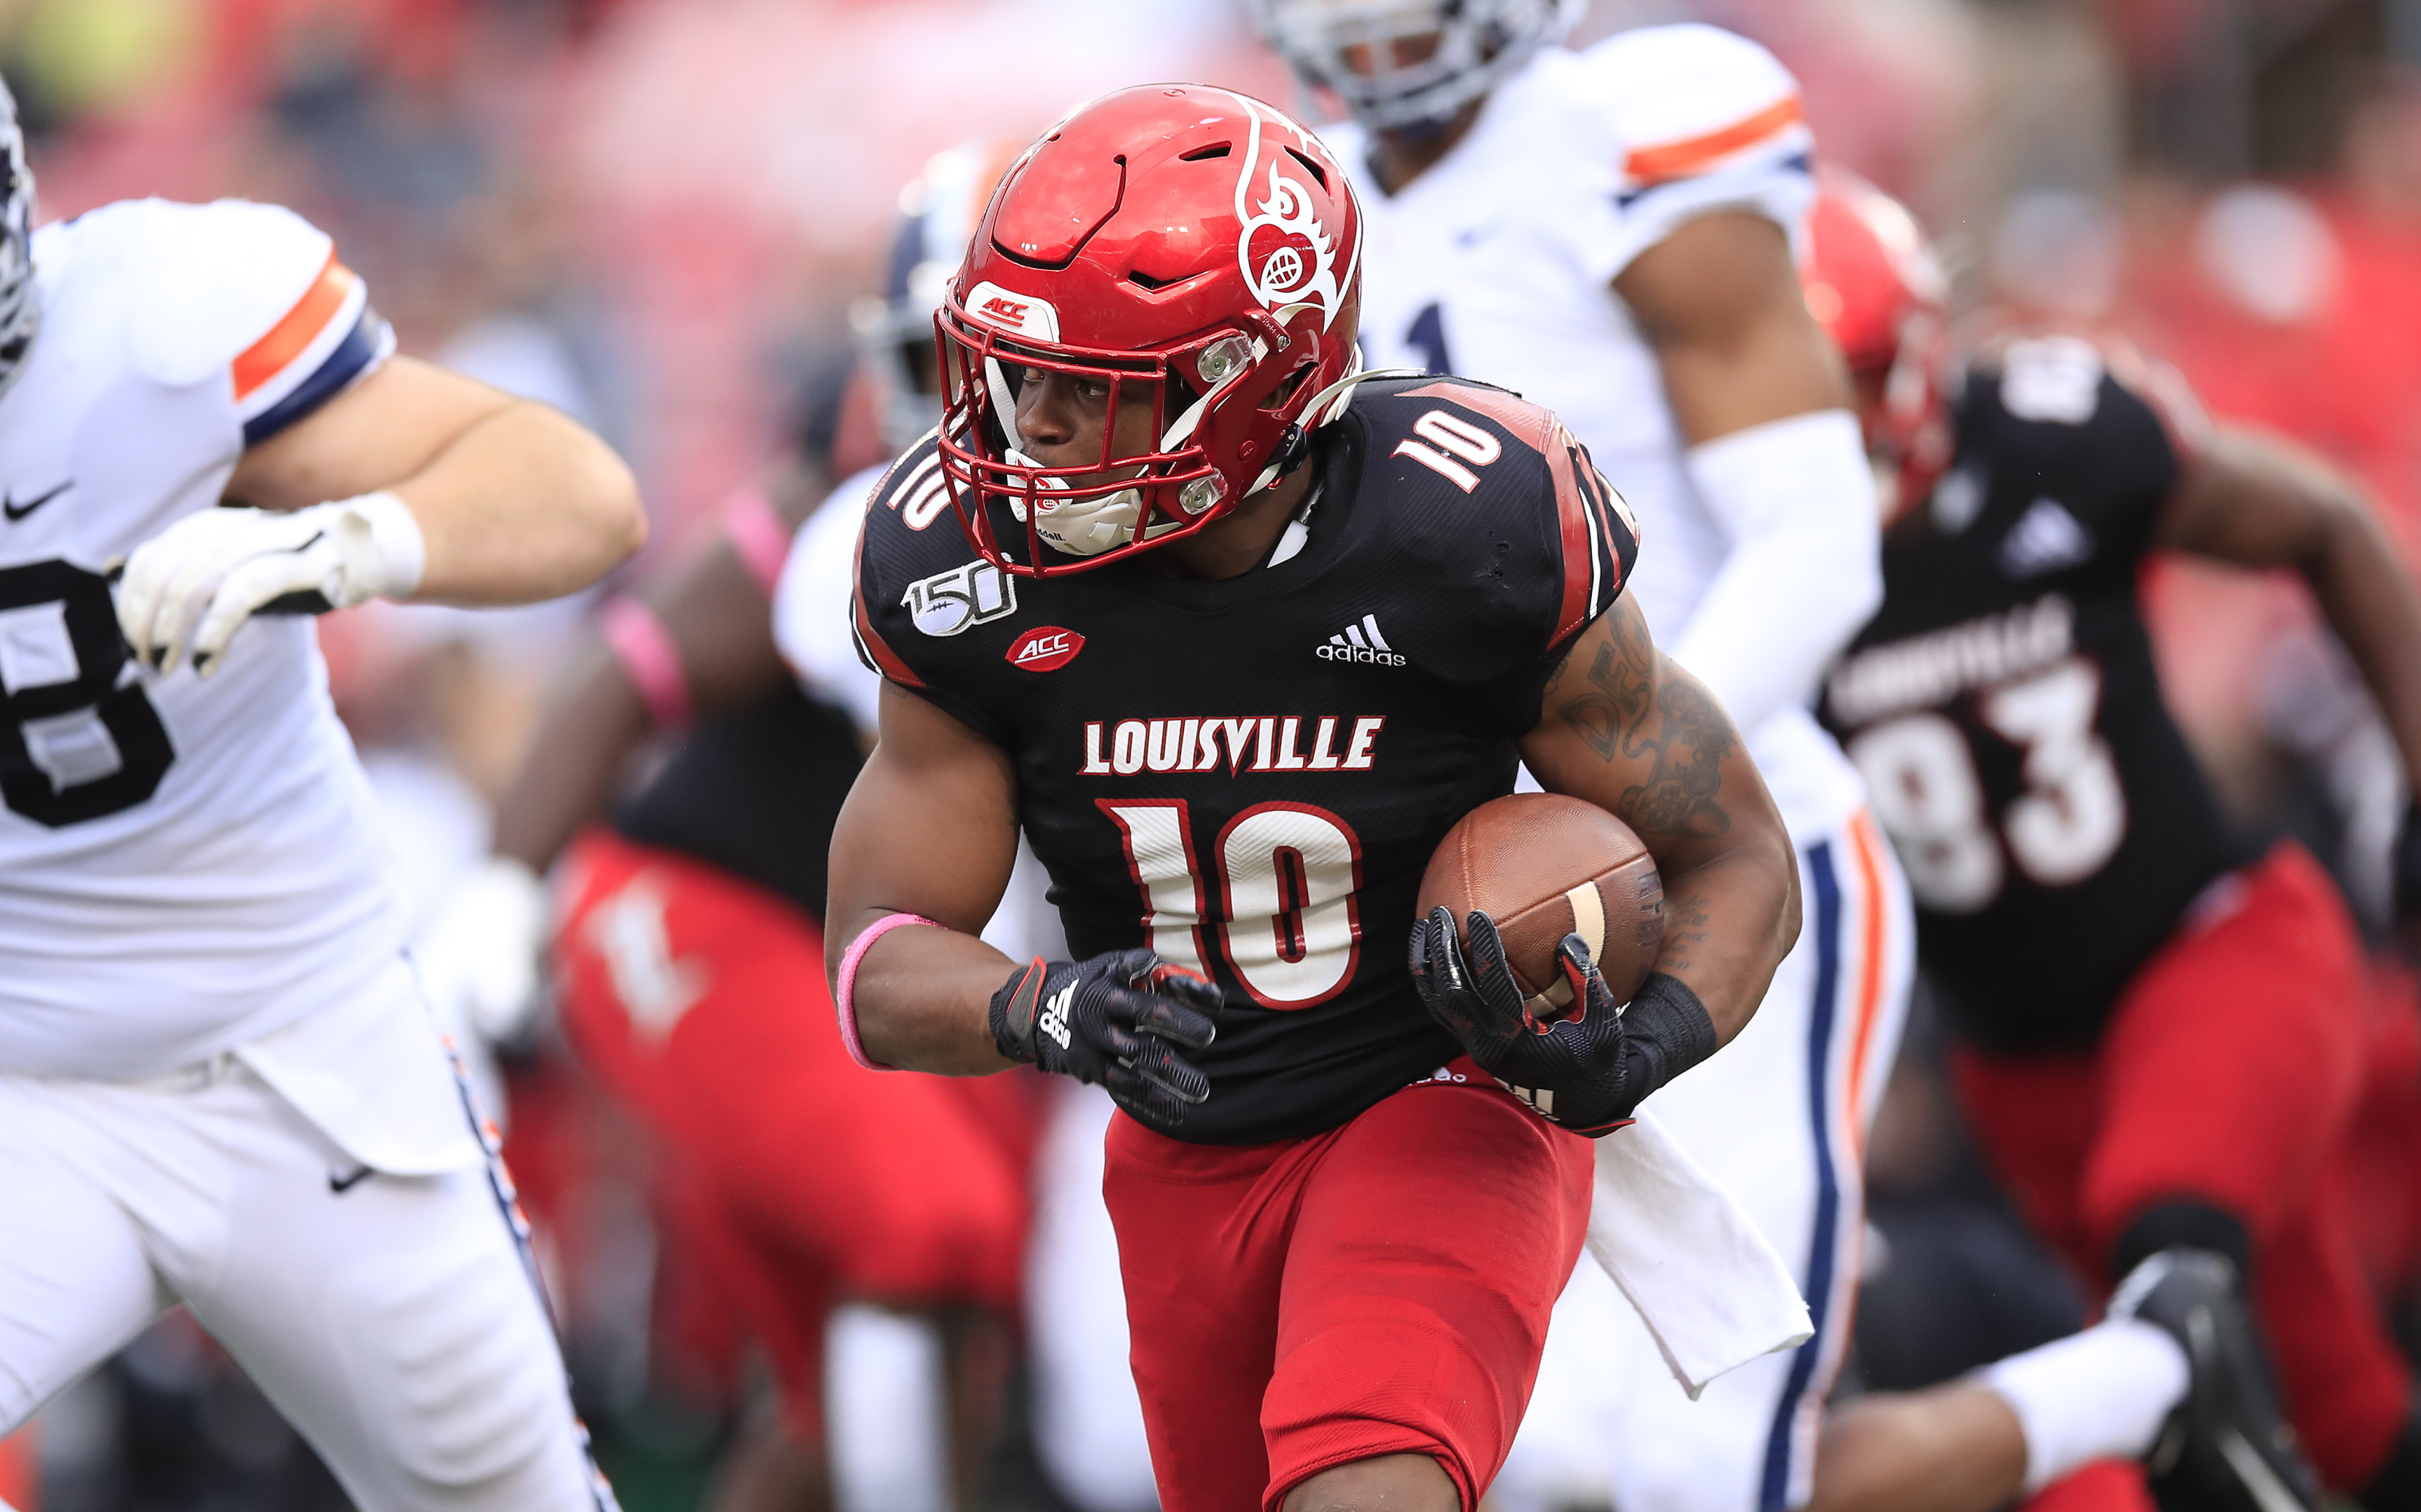 2021 NFL Draft: Do not sleep on Louisville RB Javian Hawkins